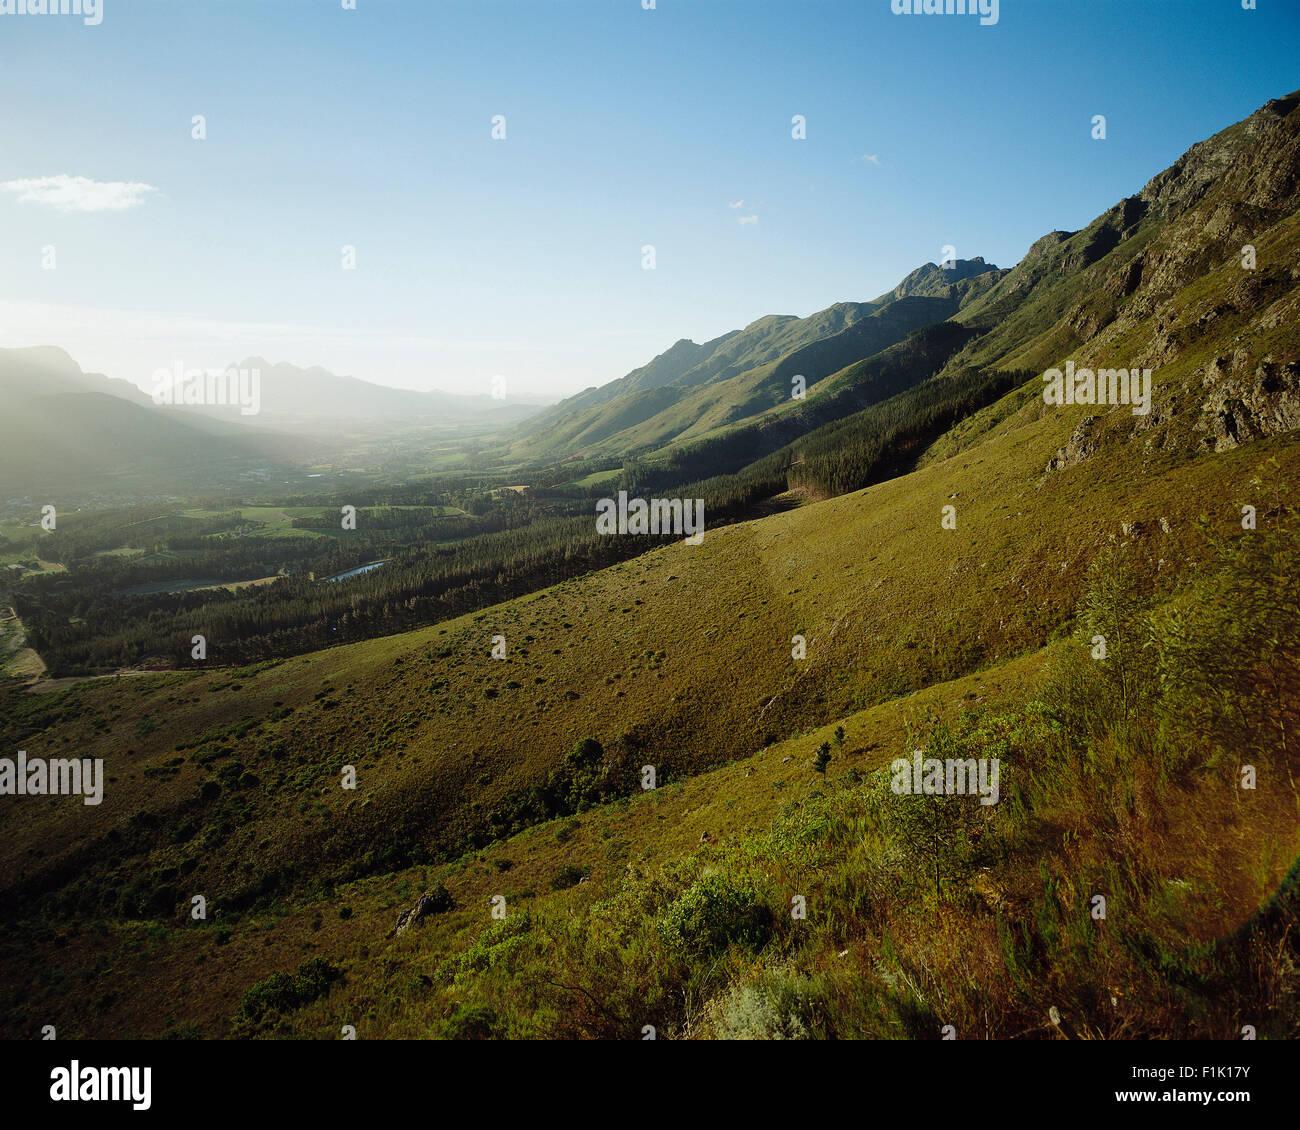 KwaZulu Natal, South Africa - Stock Image